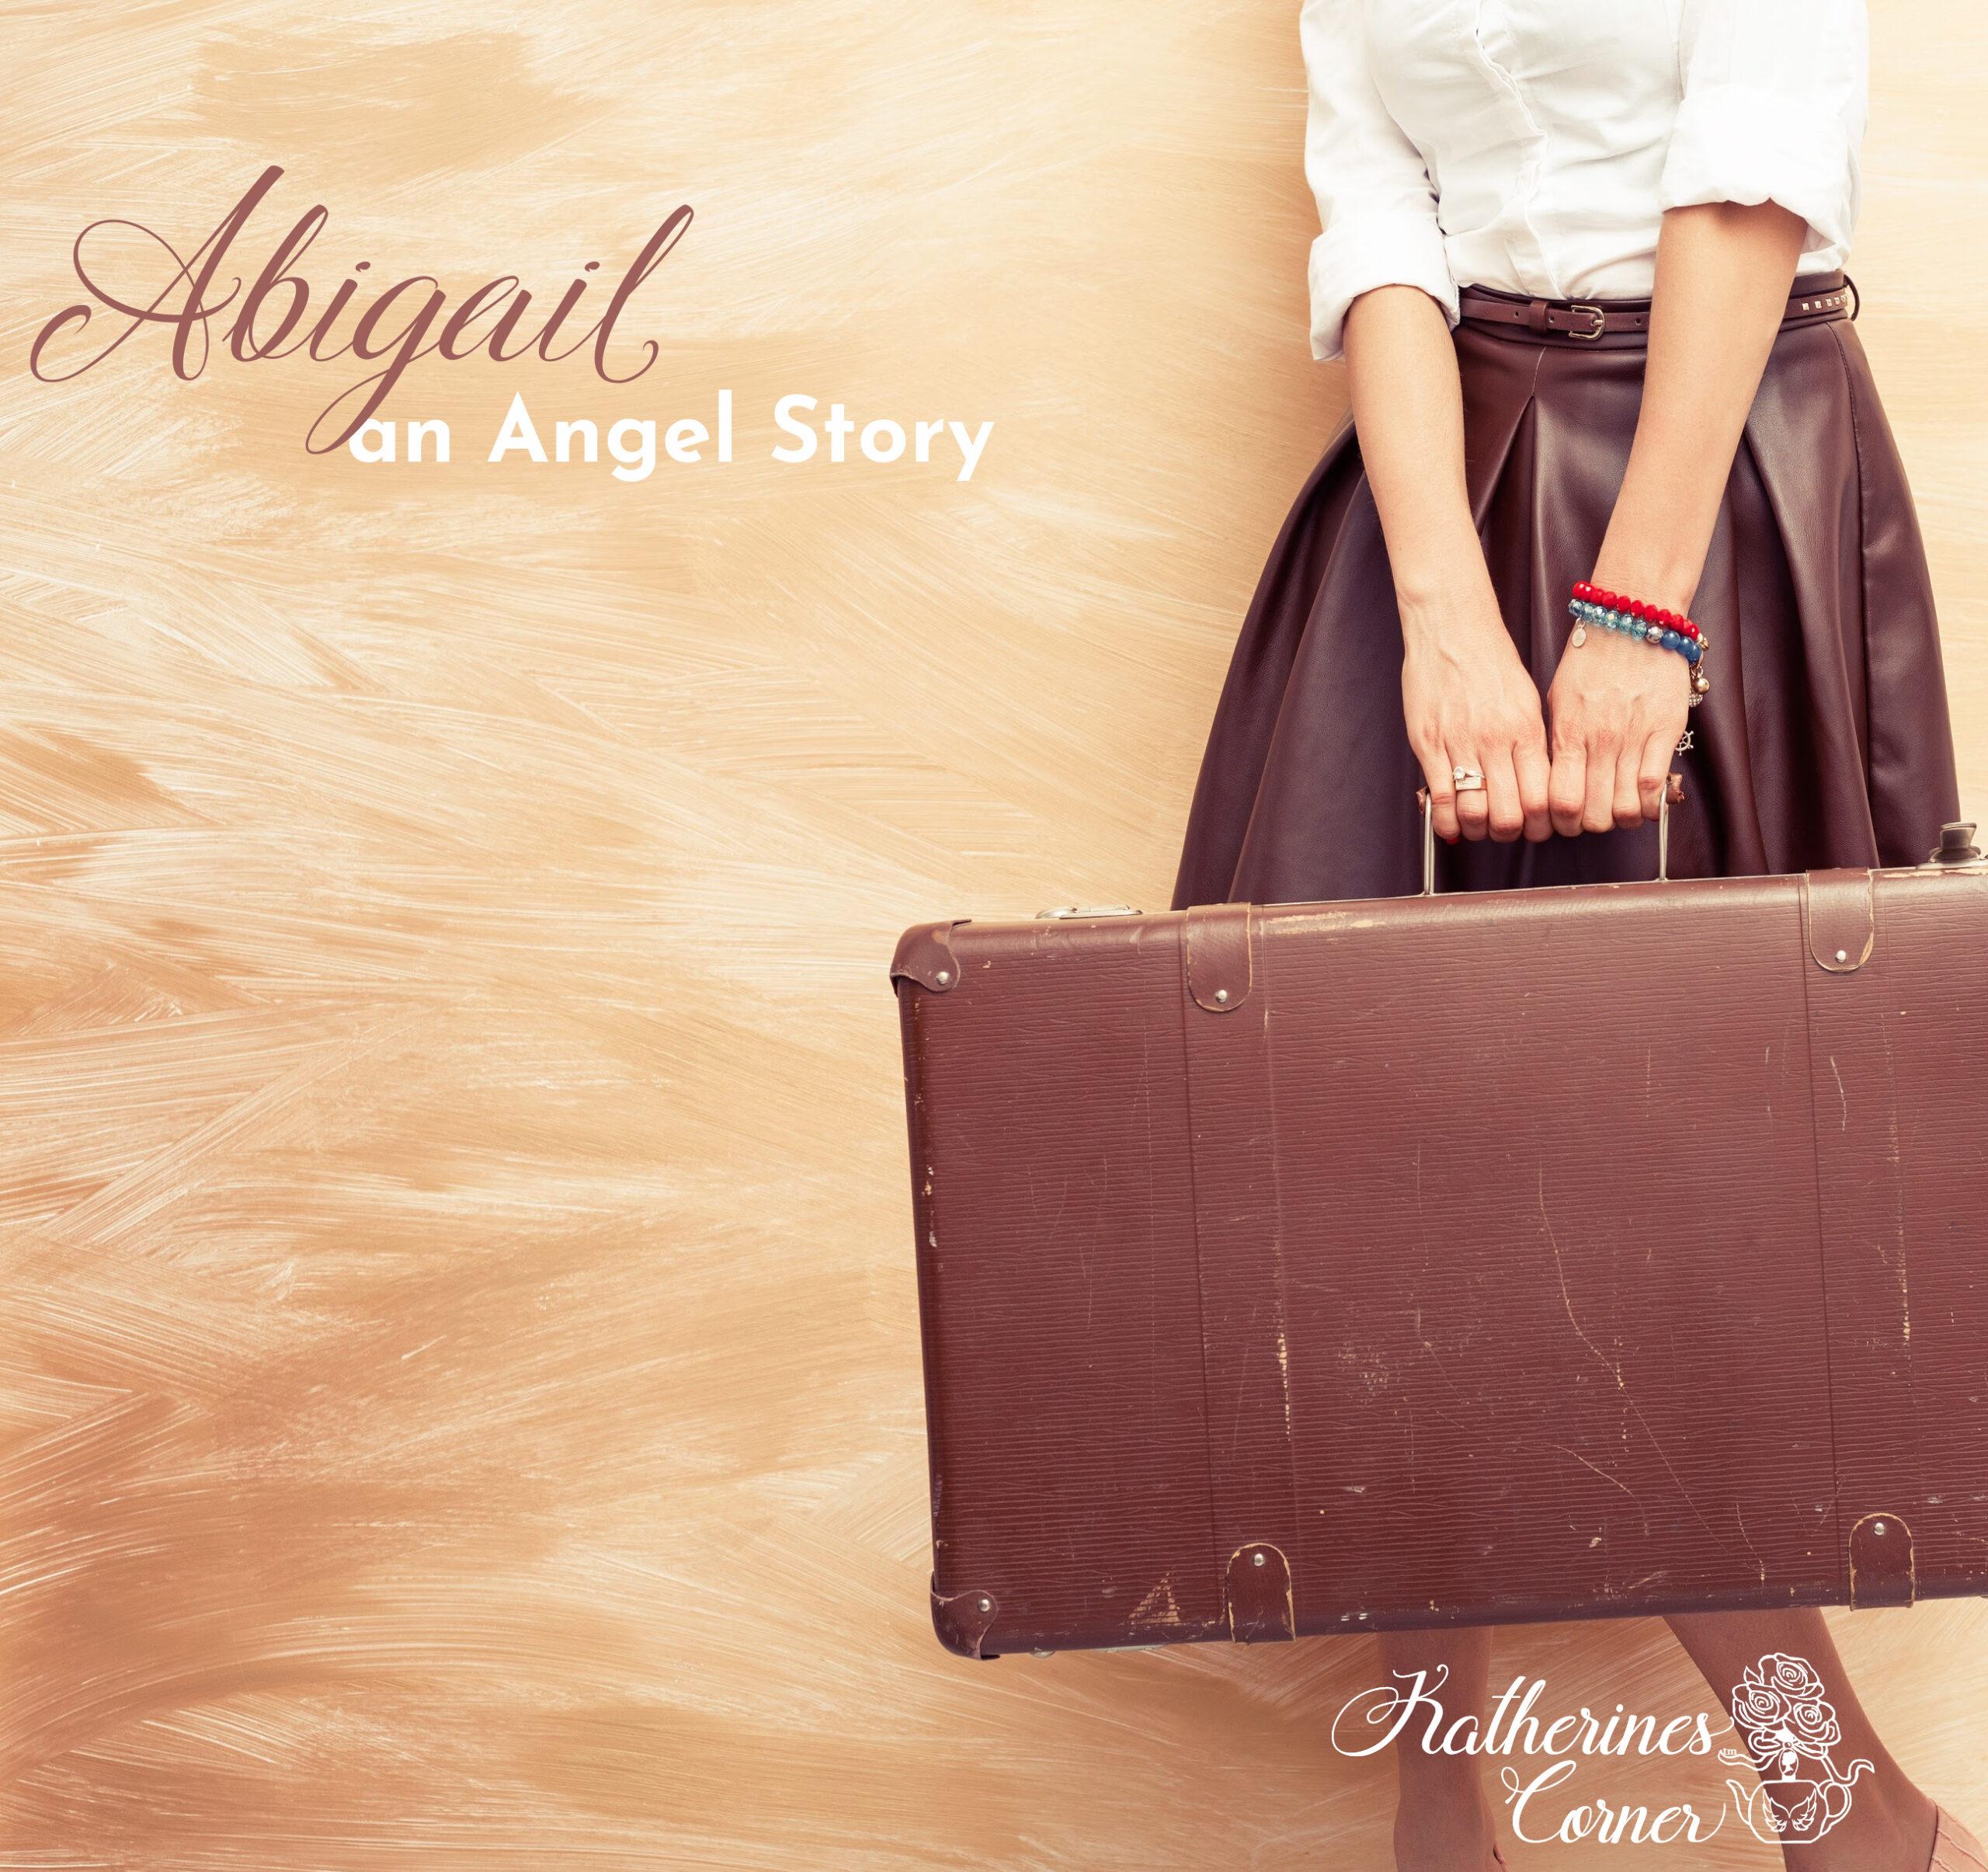 Abigail an Angel Story